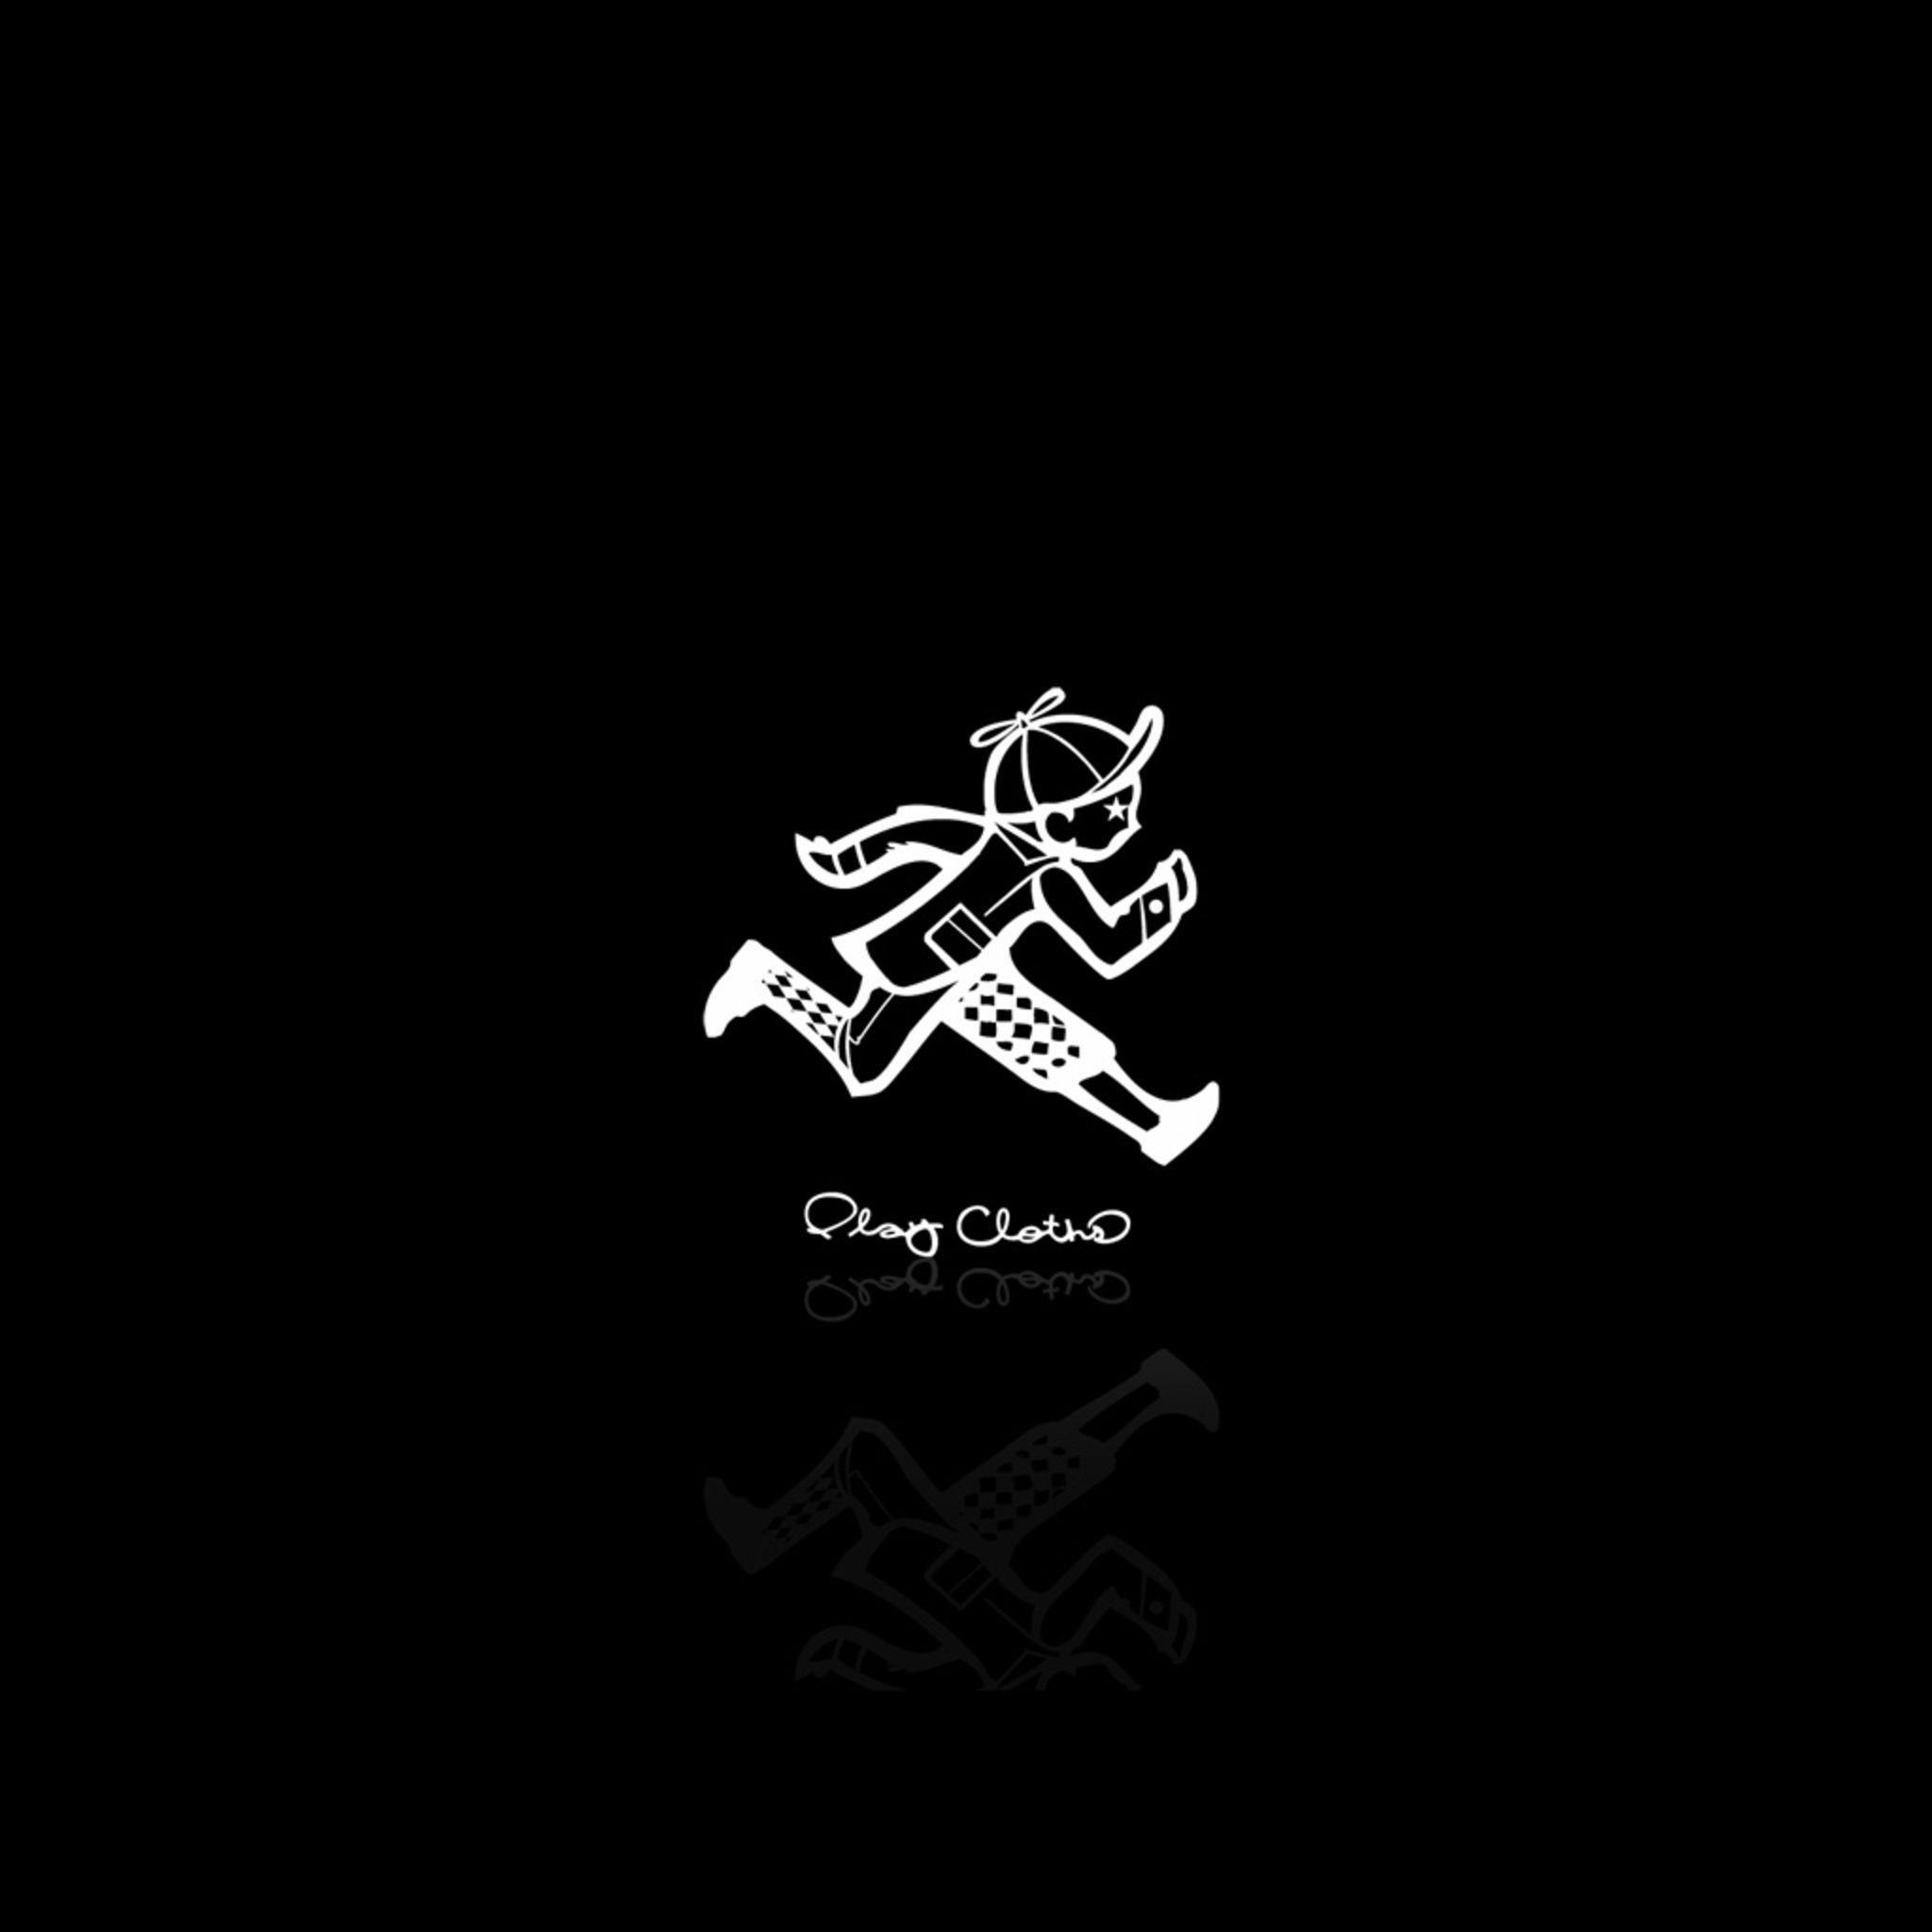 dalls cowboys logo | Dallas Cowboys Logo iPhone HD Wallpaper